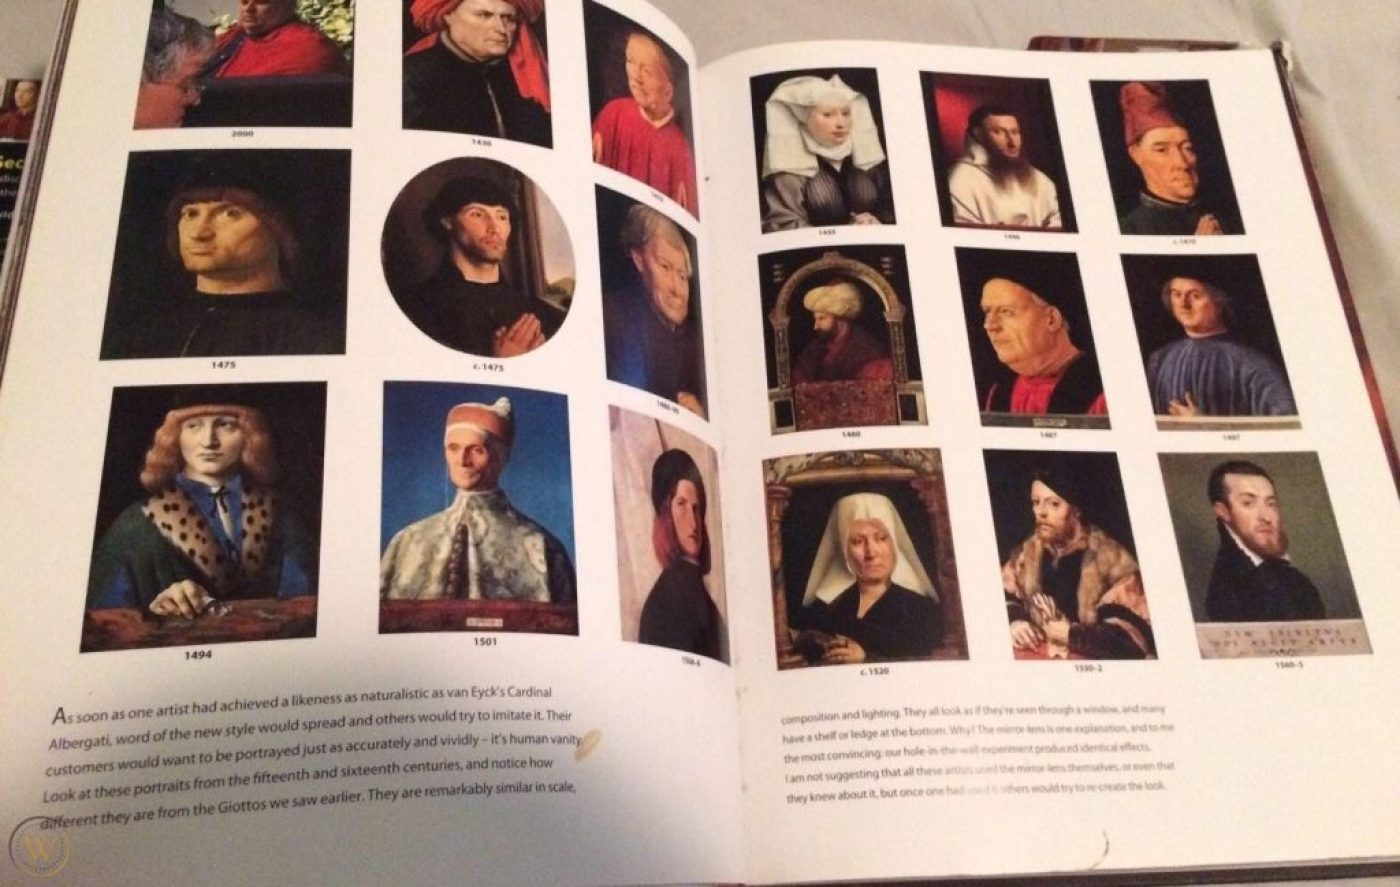 David Hockney - secret knowledge